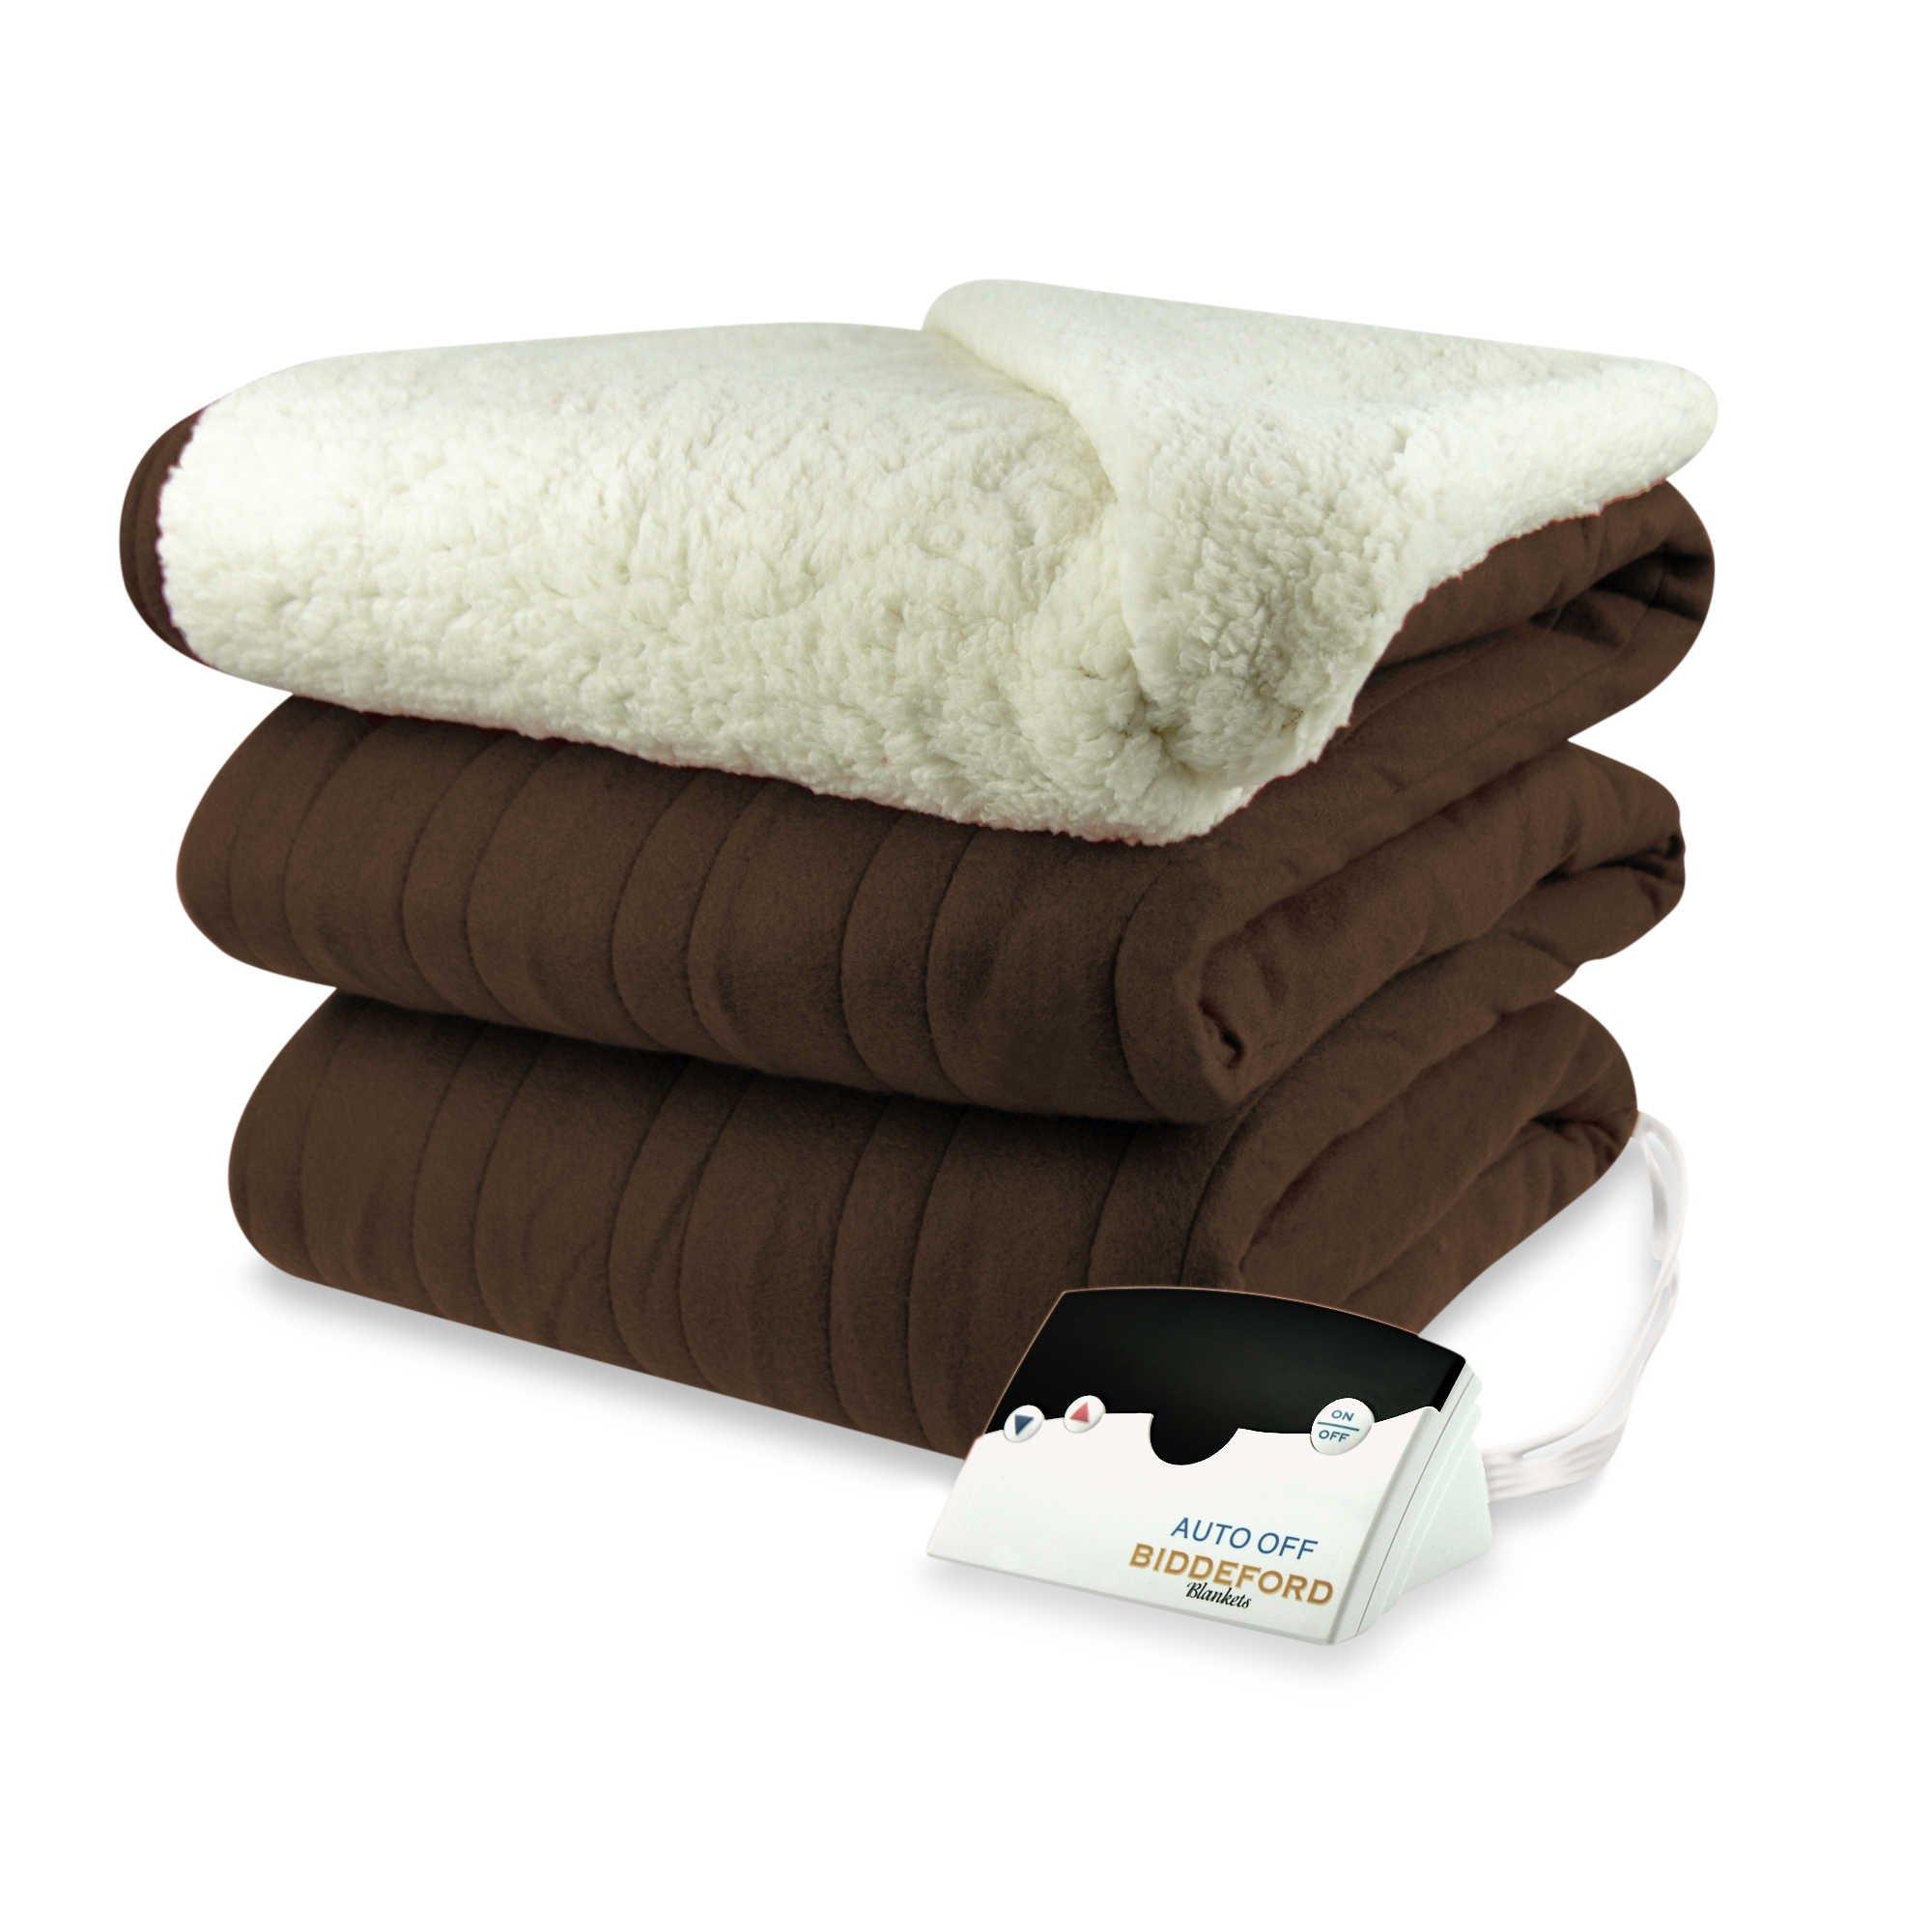 biddeford blankets microplush comfort knit sherpa heated. Black Bedroom Furniture Sets. Home Design Ideas